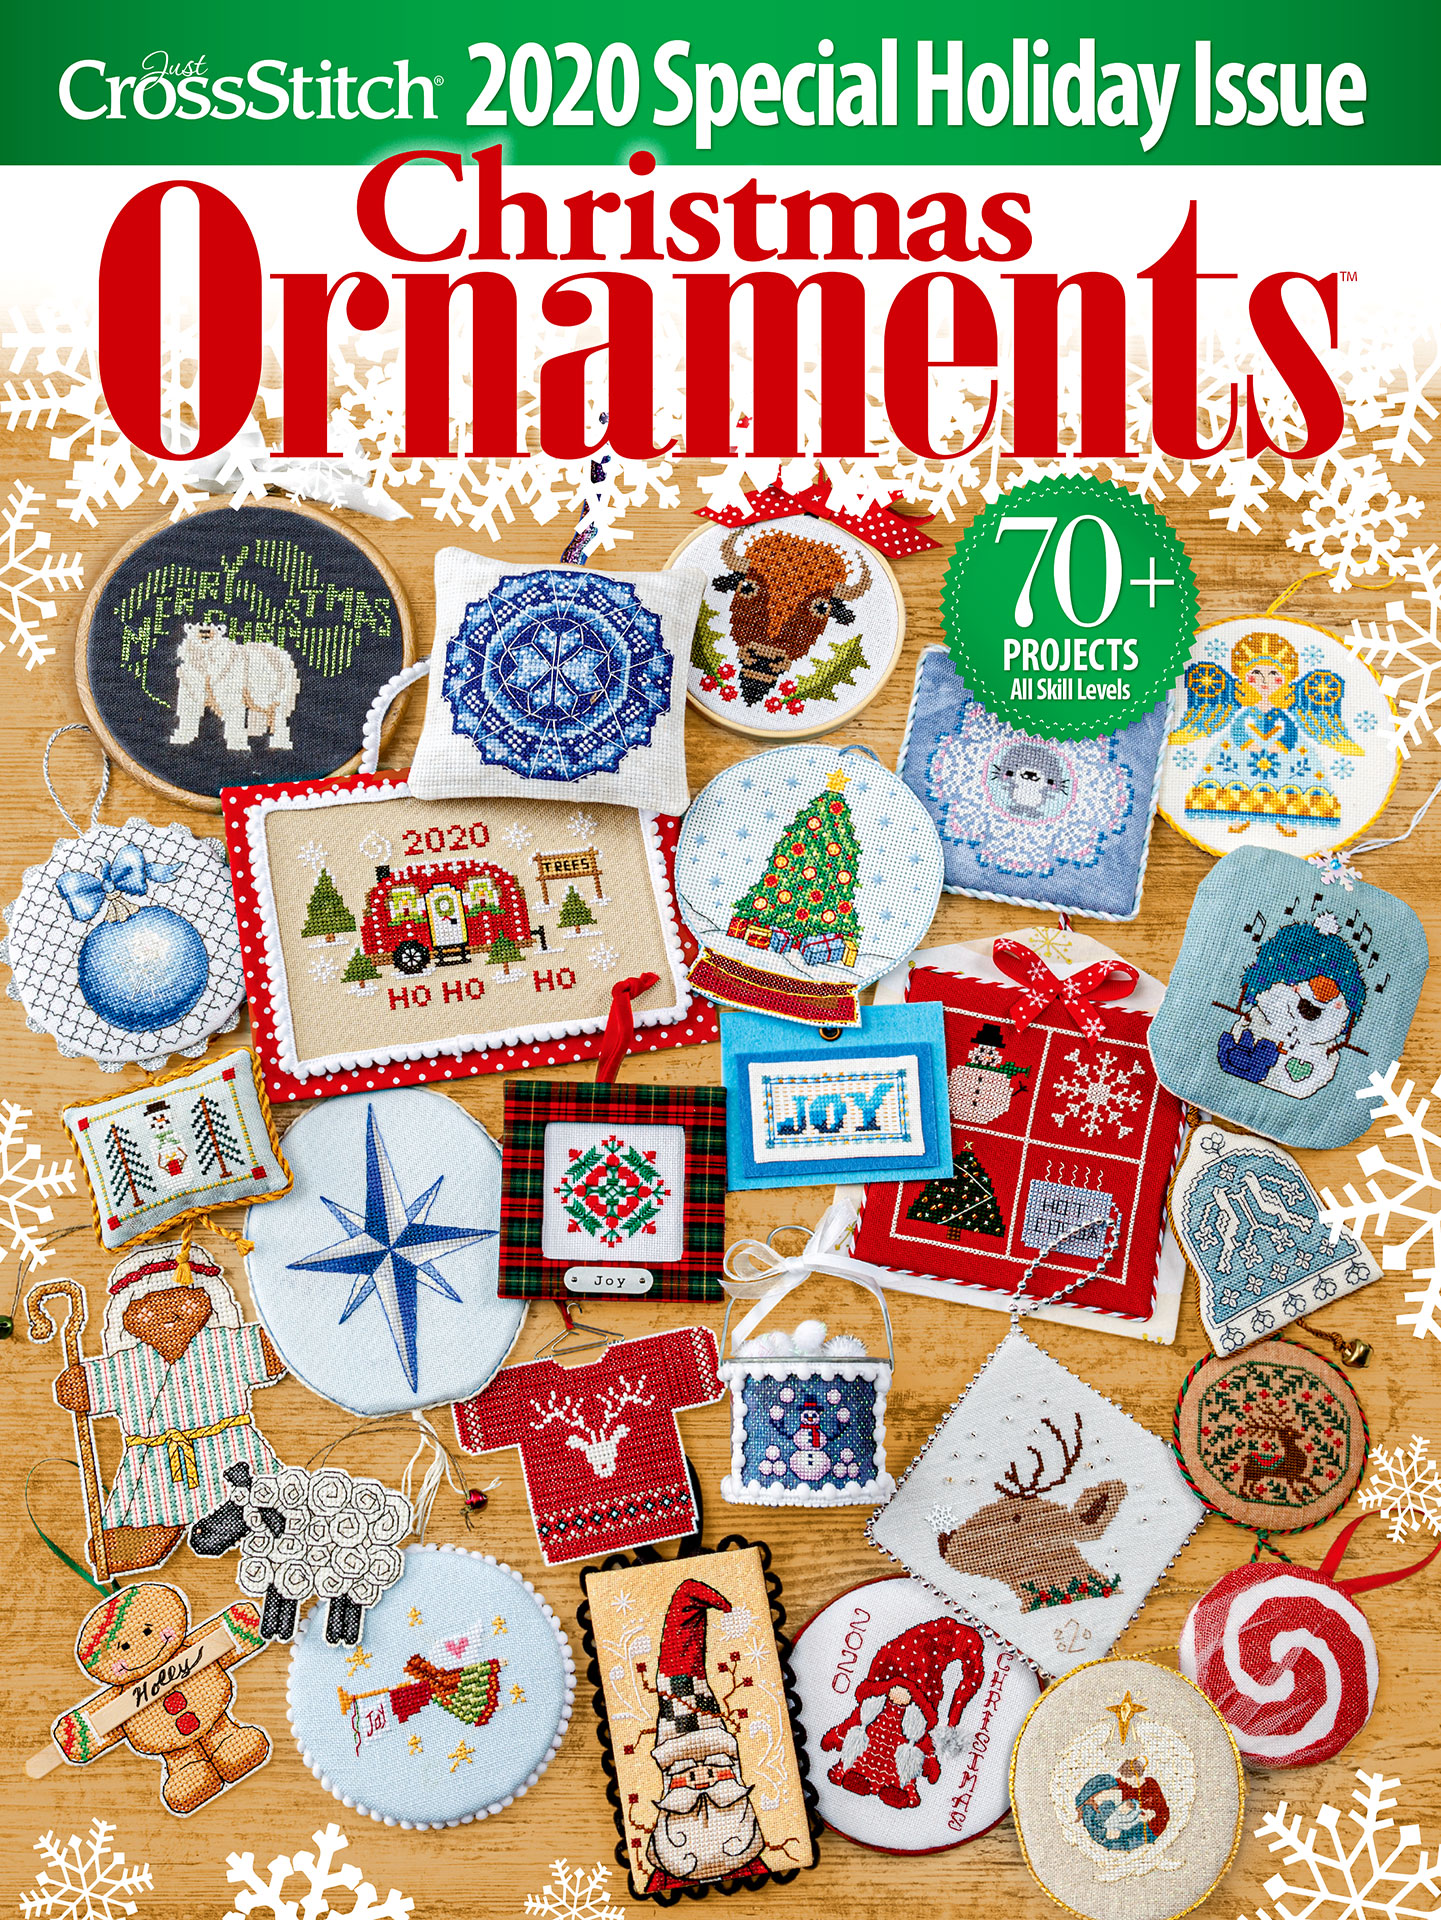 A Cross Stitch Christmas 2020 Just Cross Stitch 2020 Christmas Ornaments Magazine   123Stitch